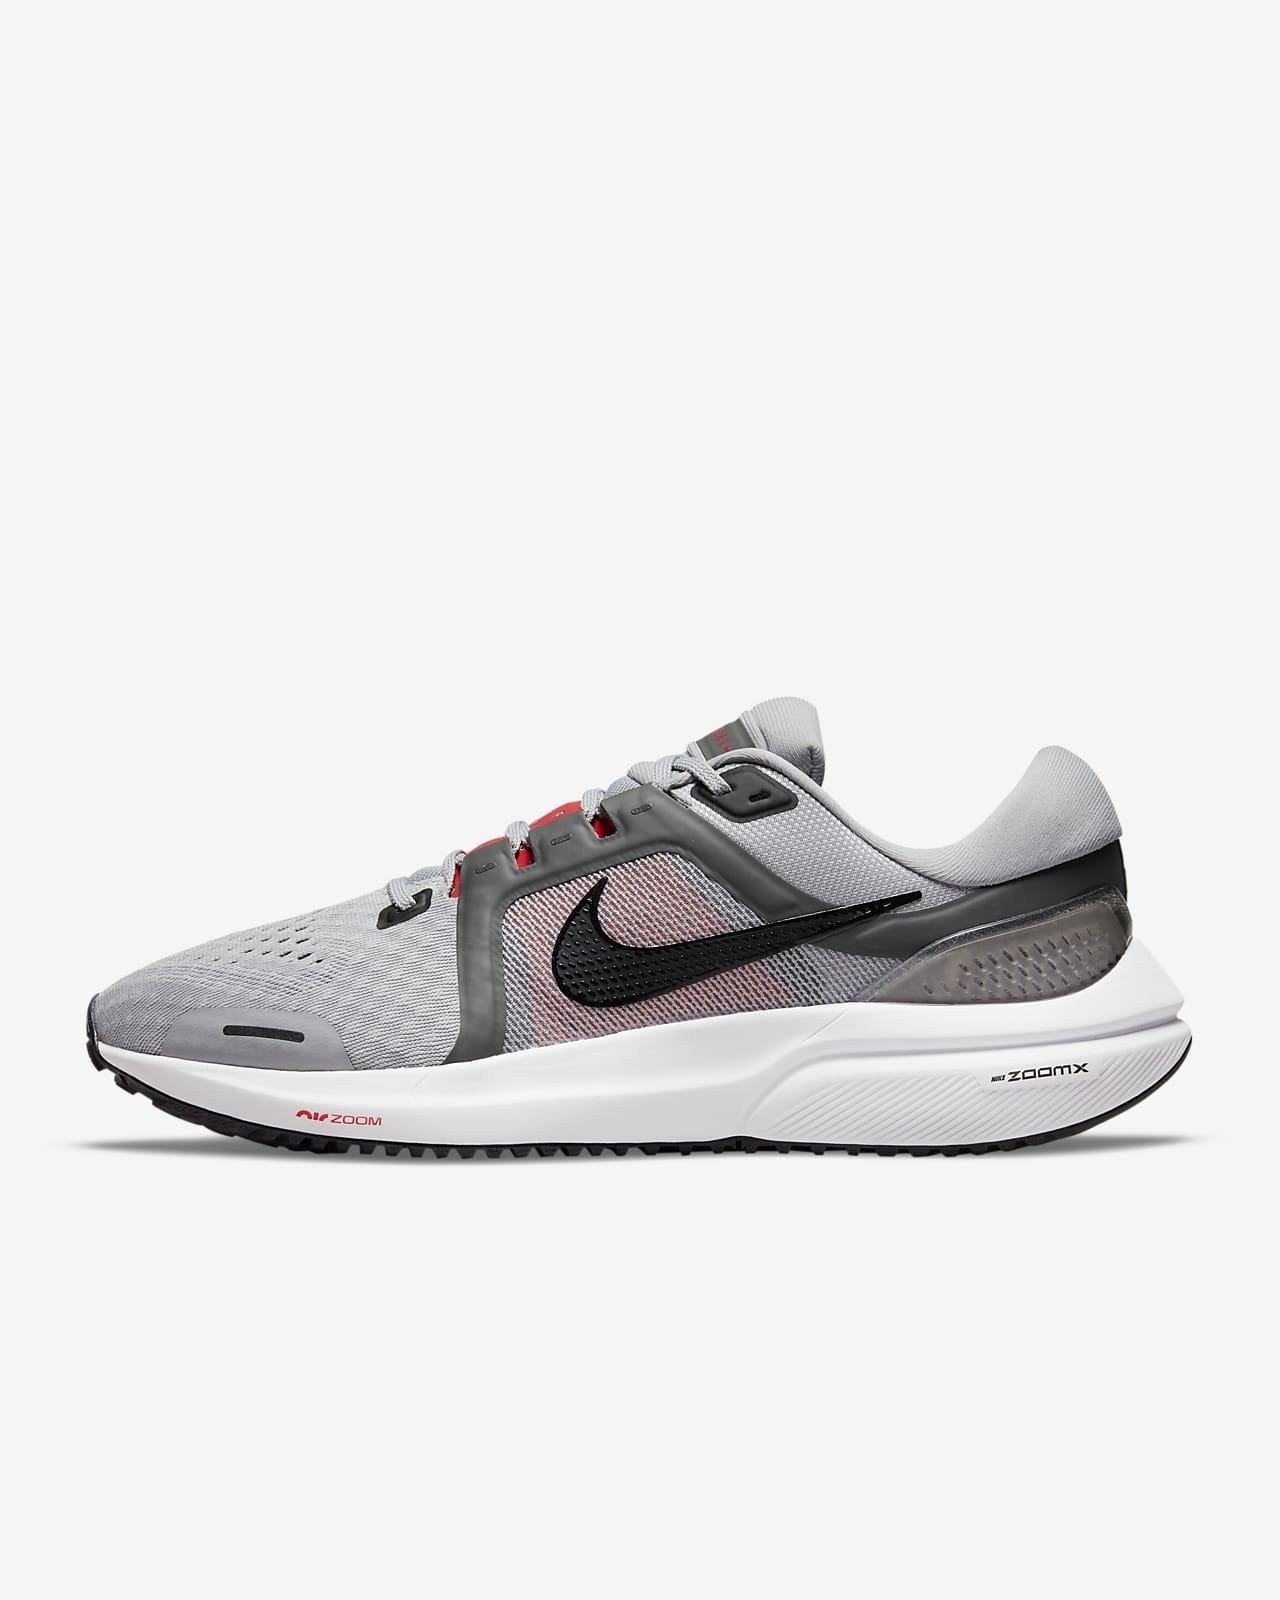 Chaussures de running sur route Nike Air Zoom Vomero 16 pour Homme ...